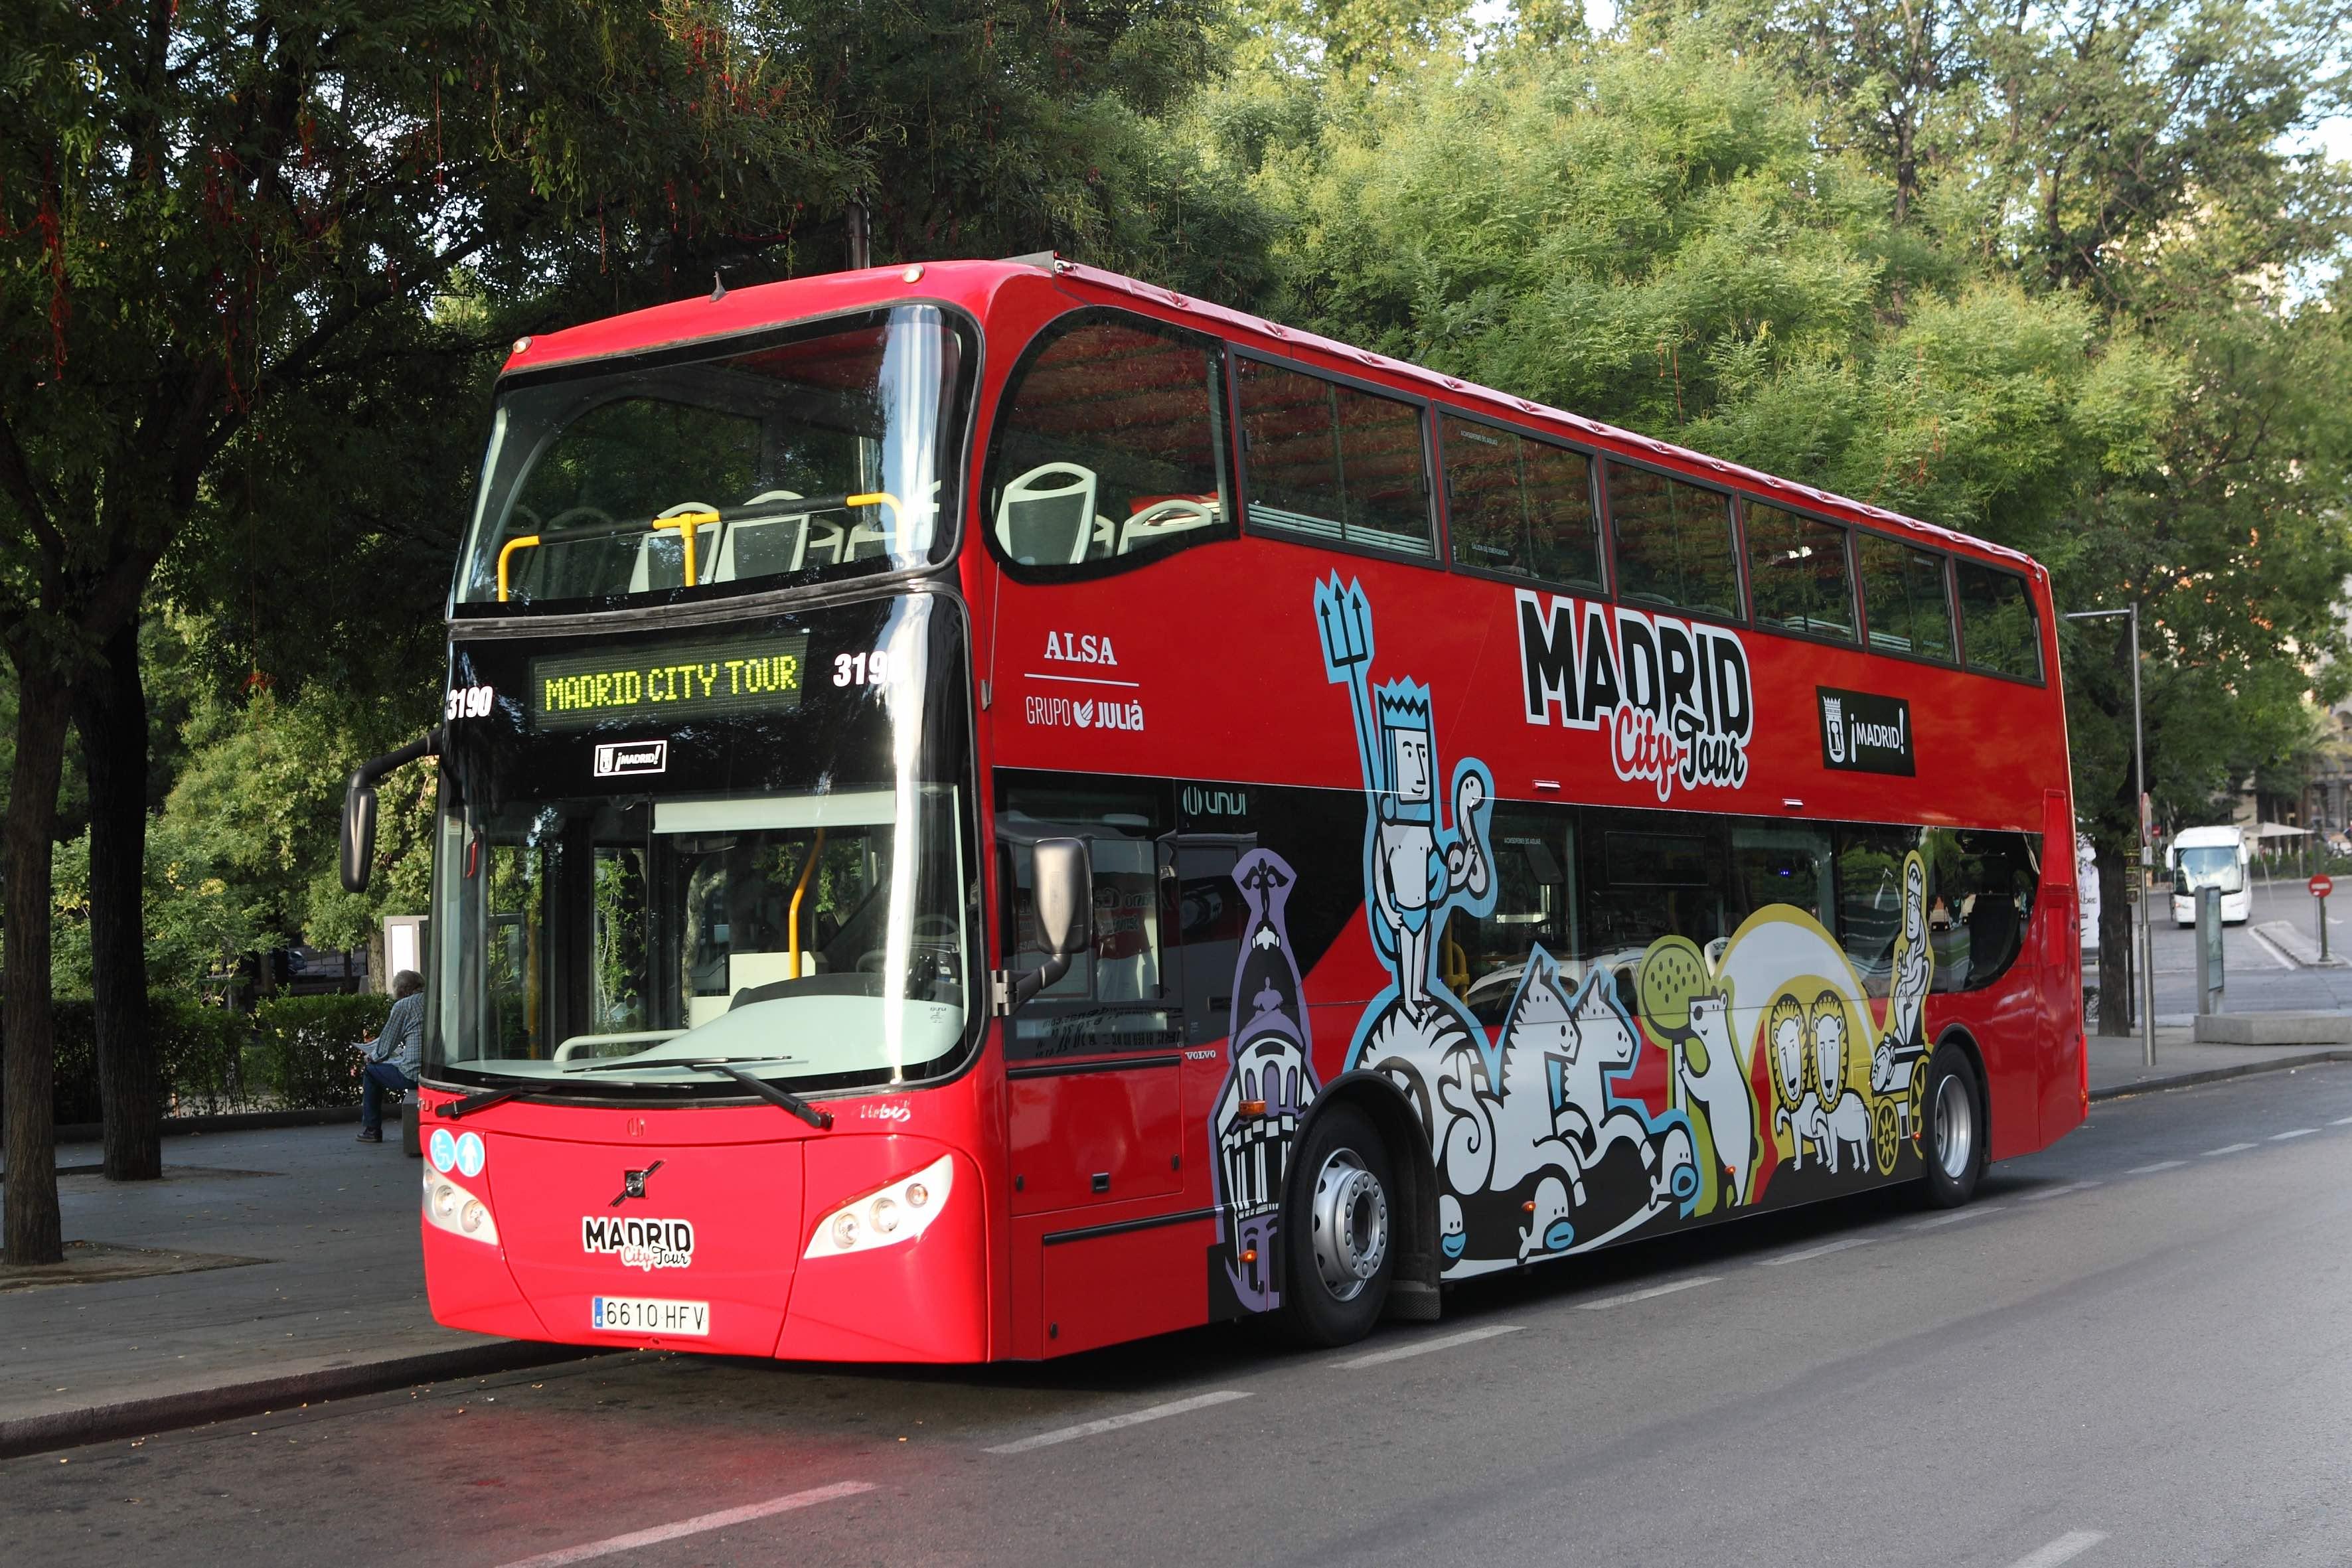 Madrid City Hop-on Hop-off Sightseeing Bus